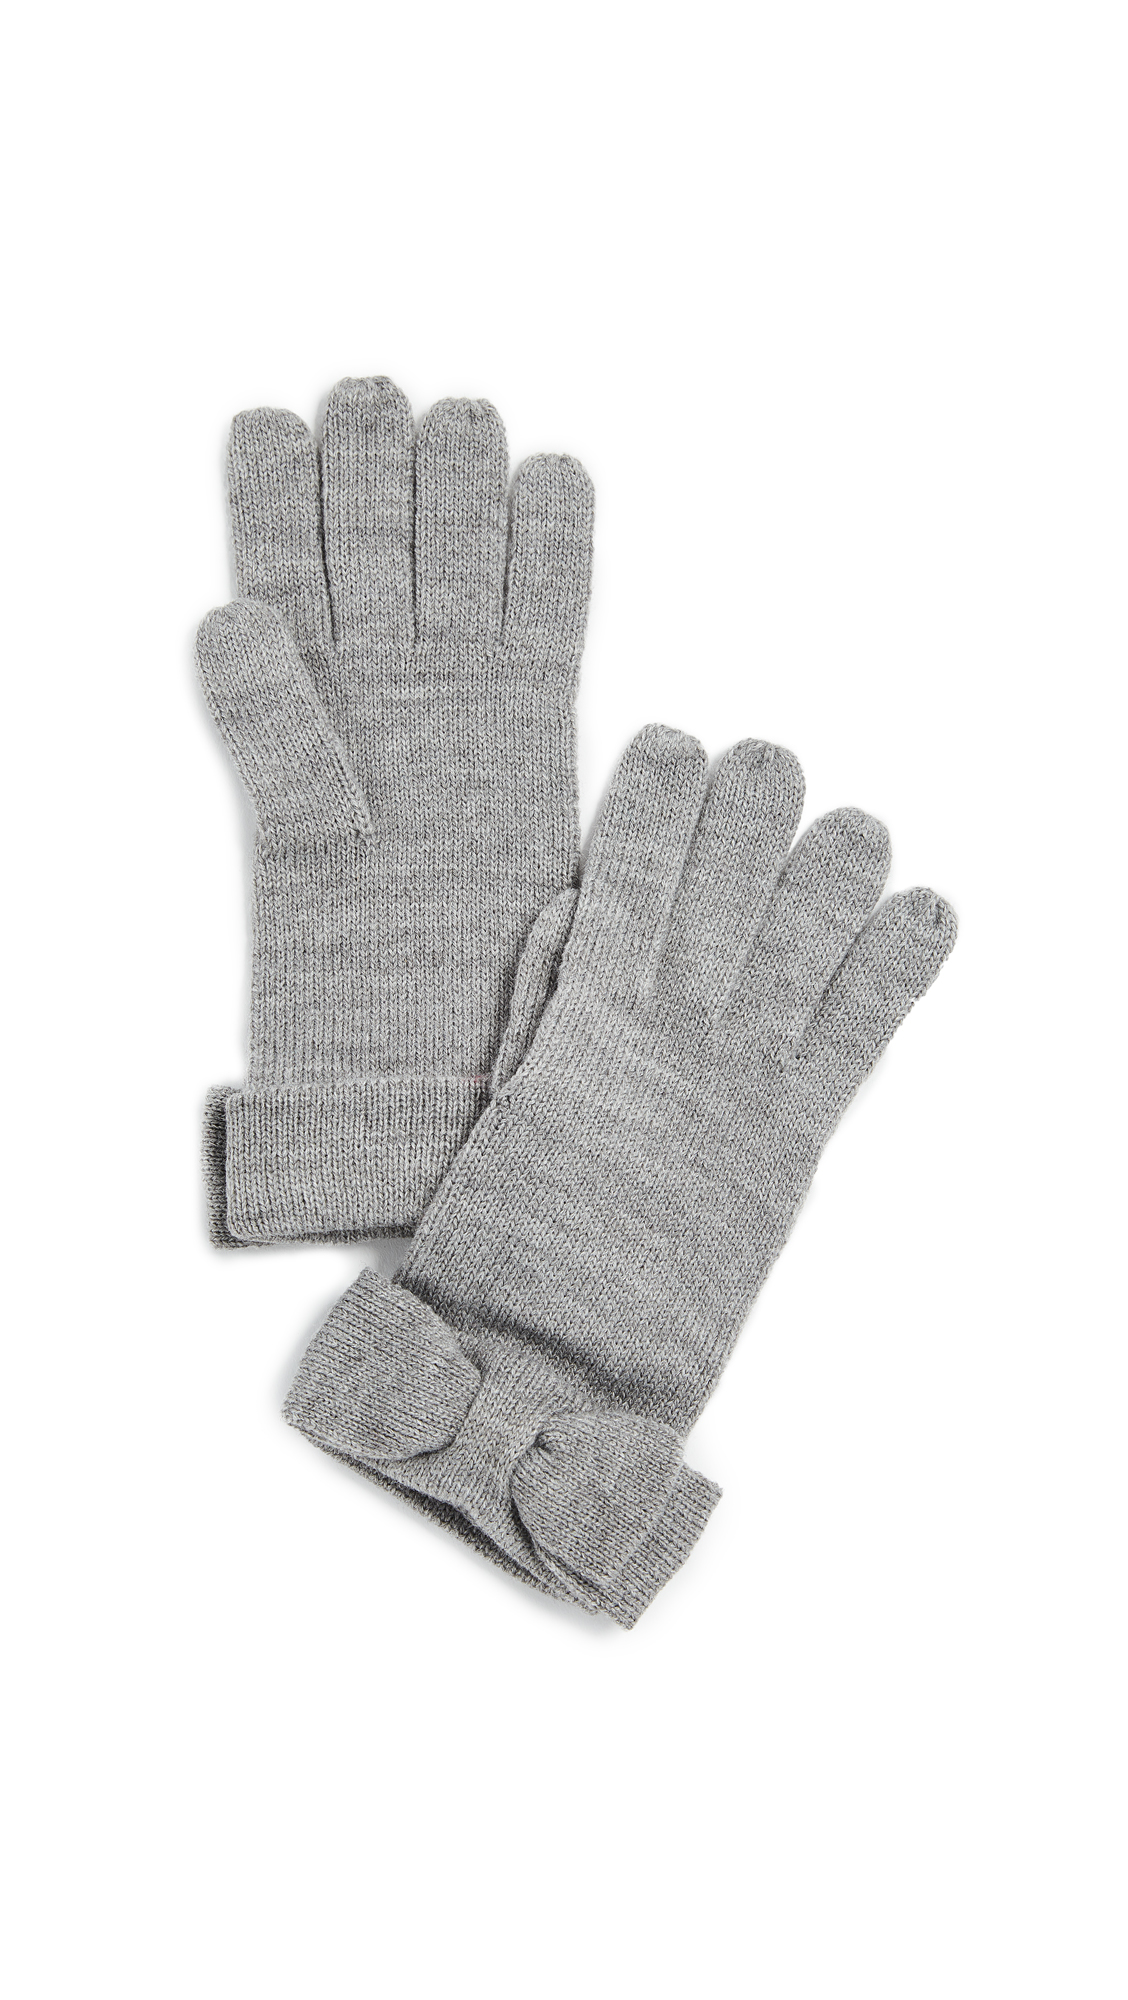 Kate Spade New York Half Bow Gloves - Heather Grey